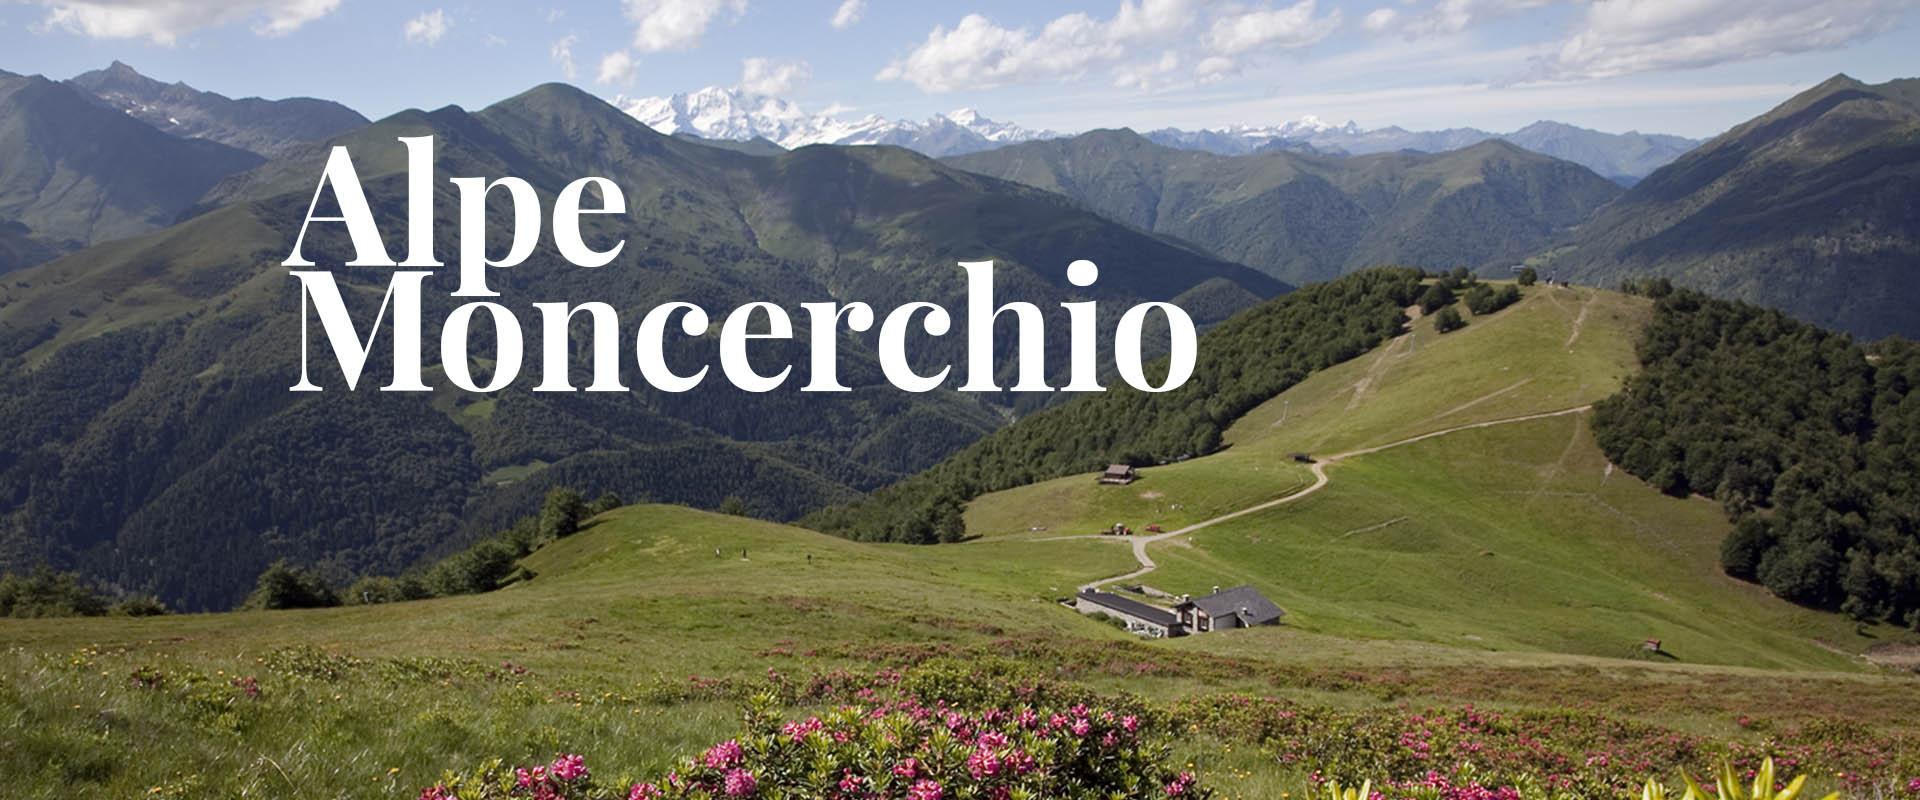 1-alpemoncerchio-home